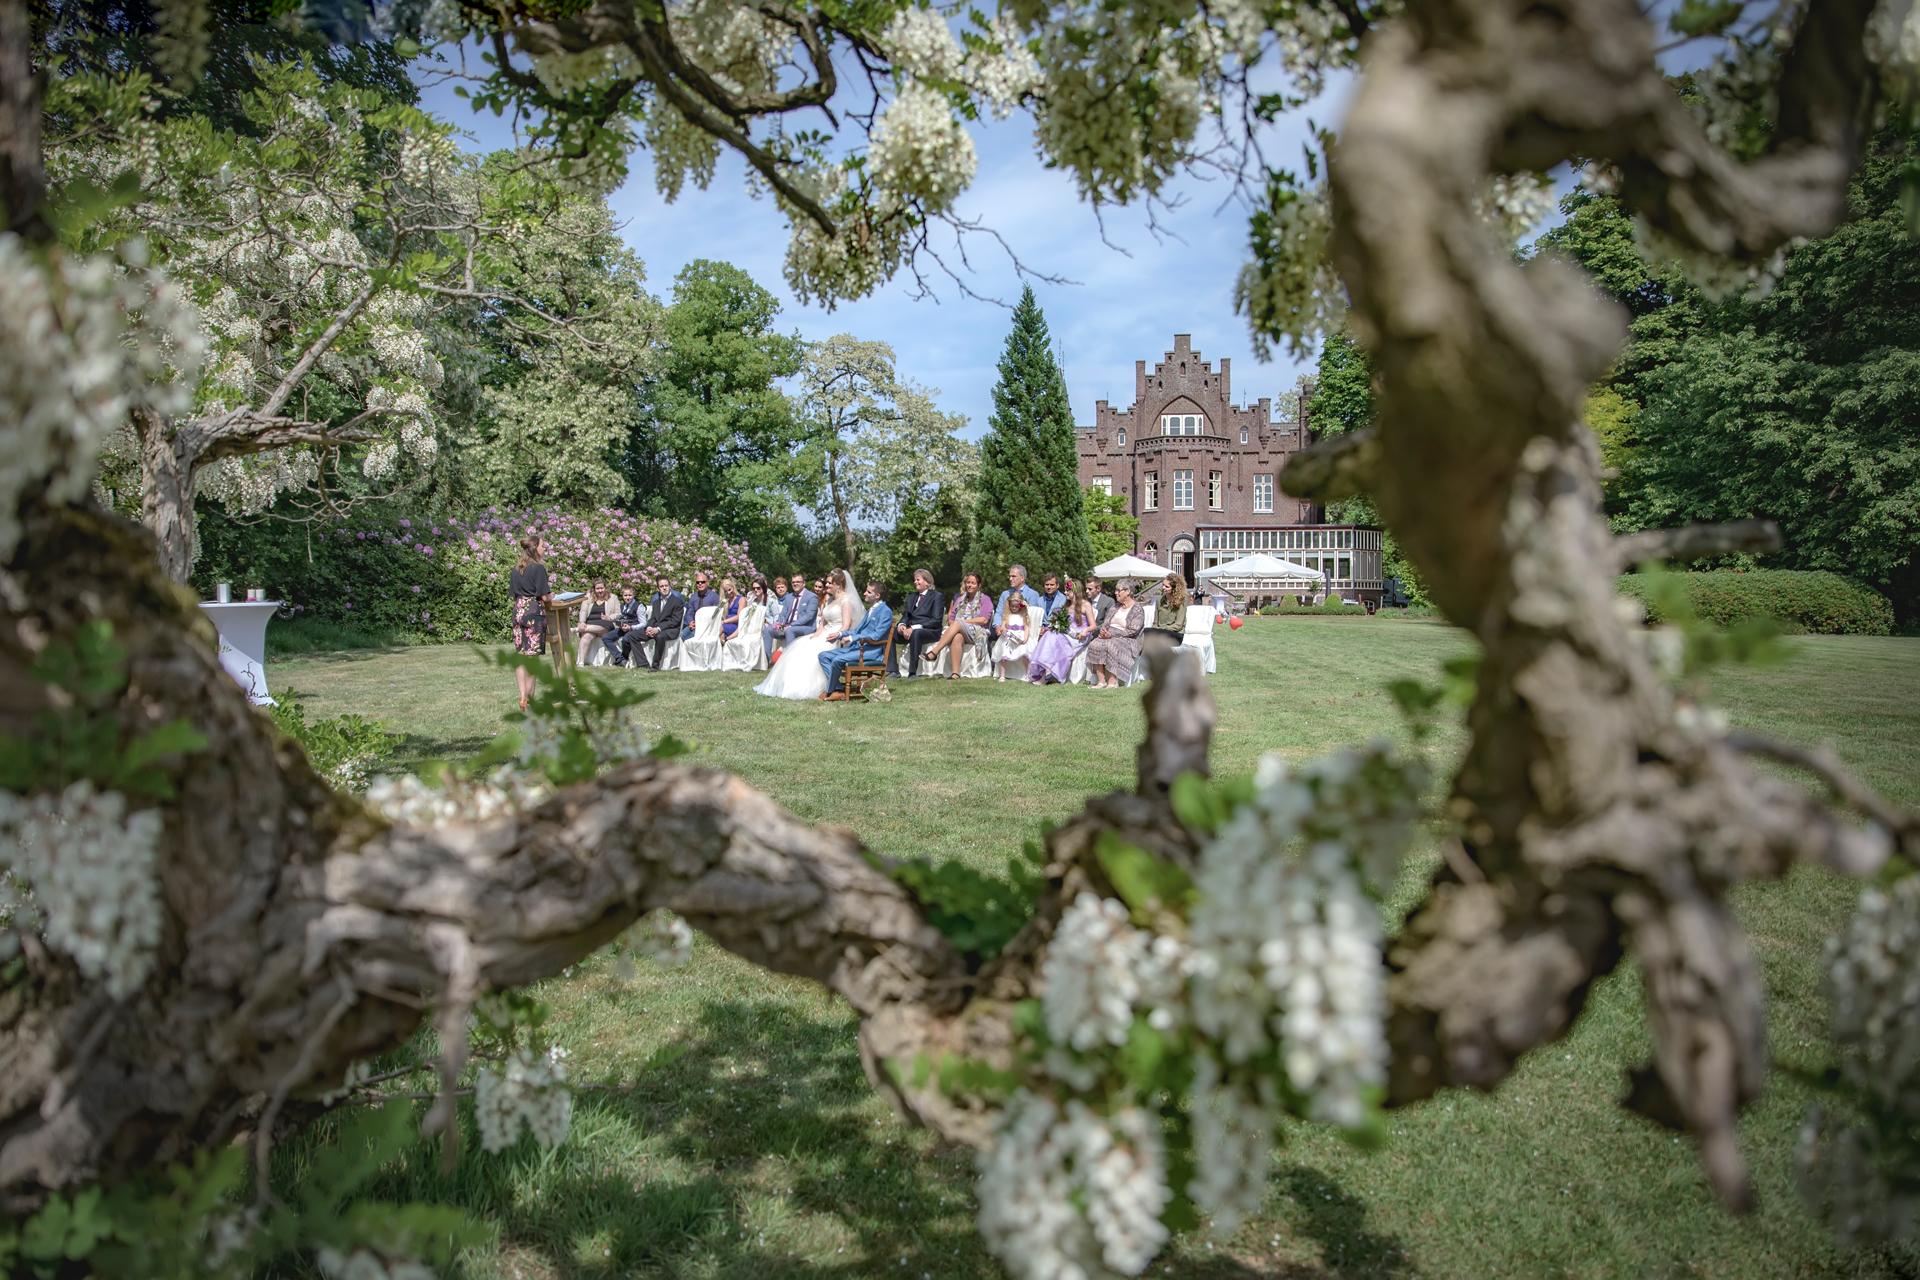 peggylaugsfotografie-limburg-trouwen-bruiloft-kasteel-landgoedkasteelaerwinkel